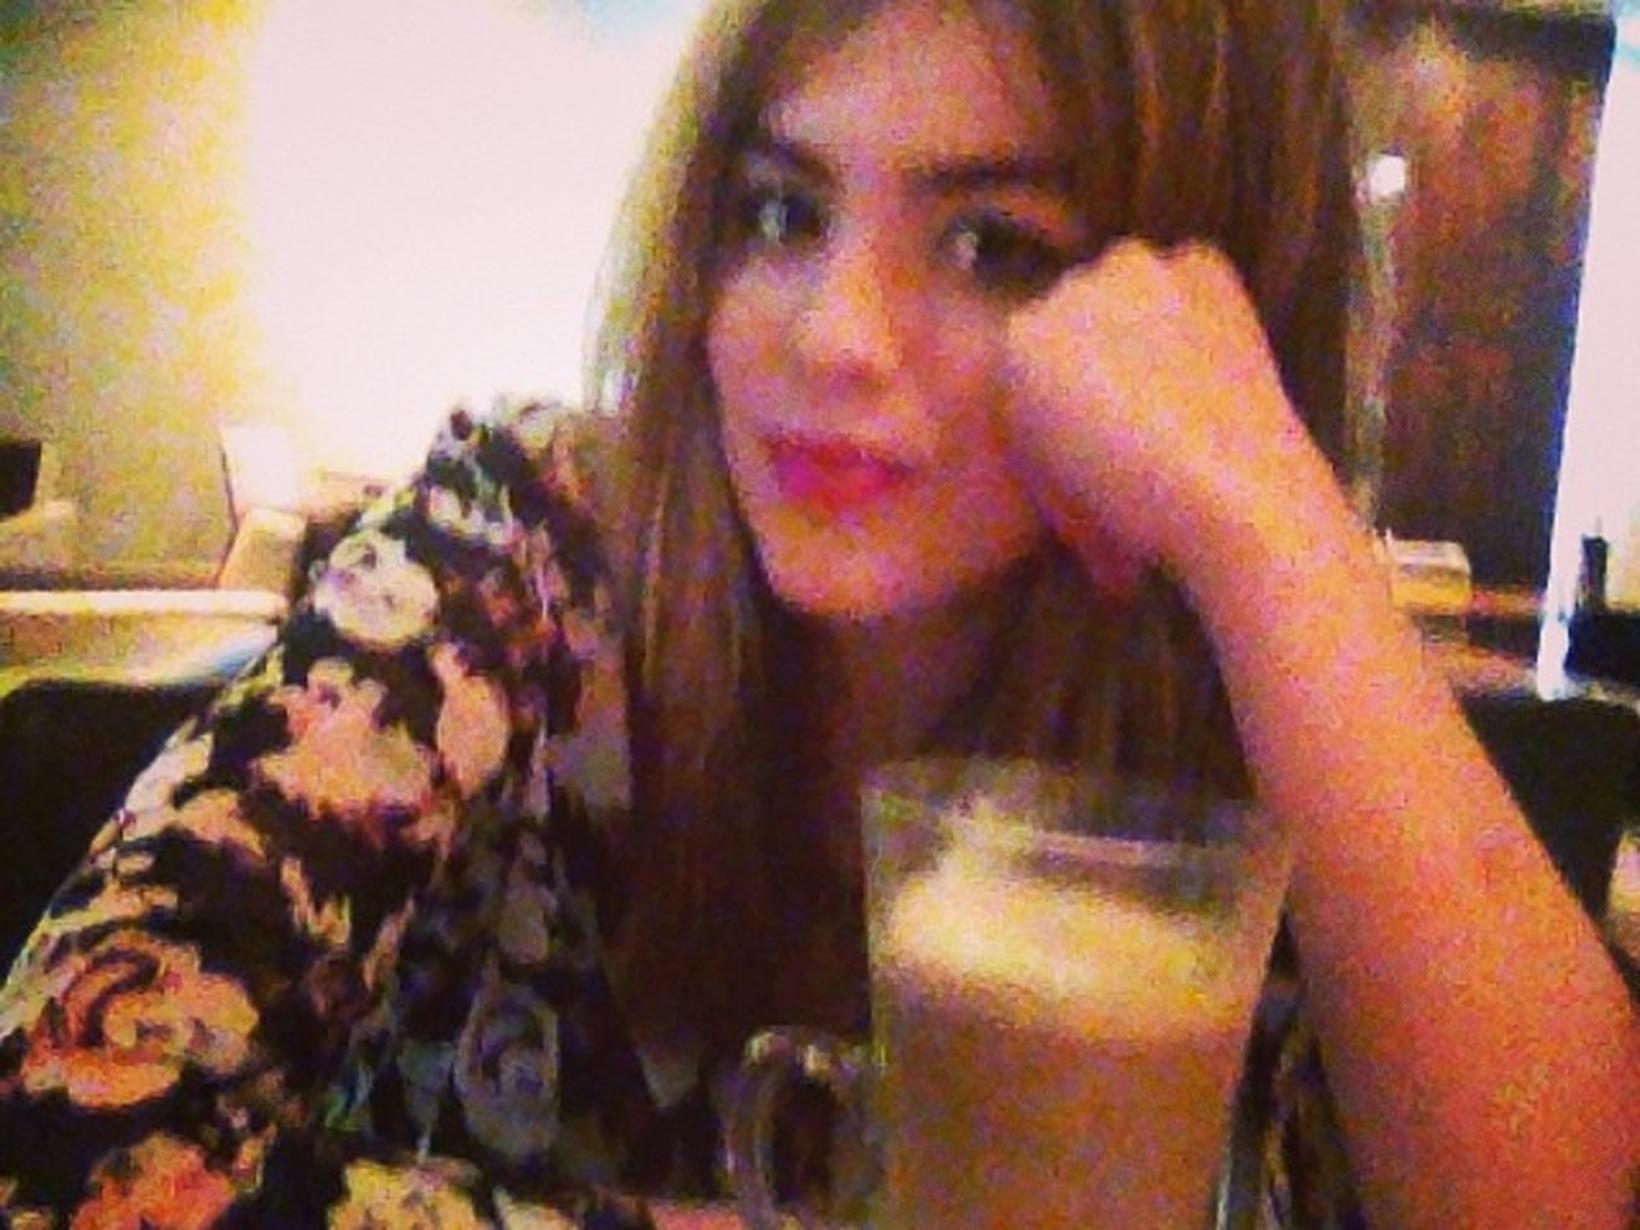 Nicola from London, United Kingdom